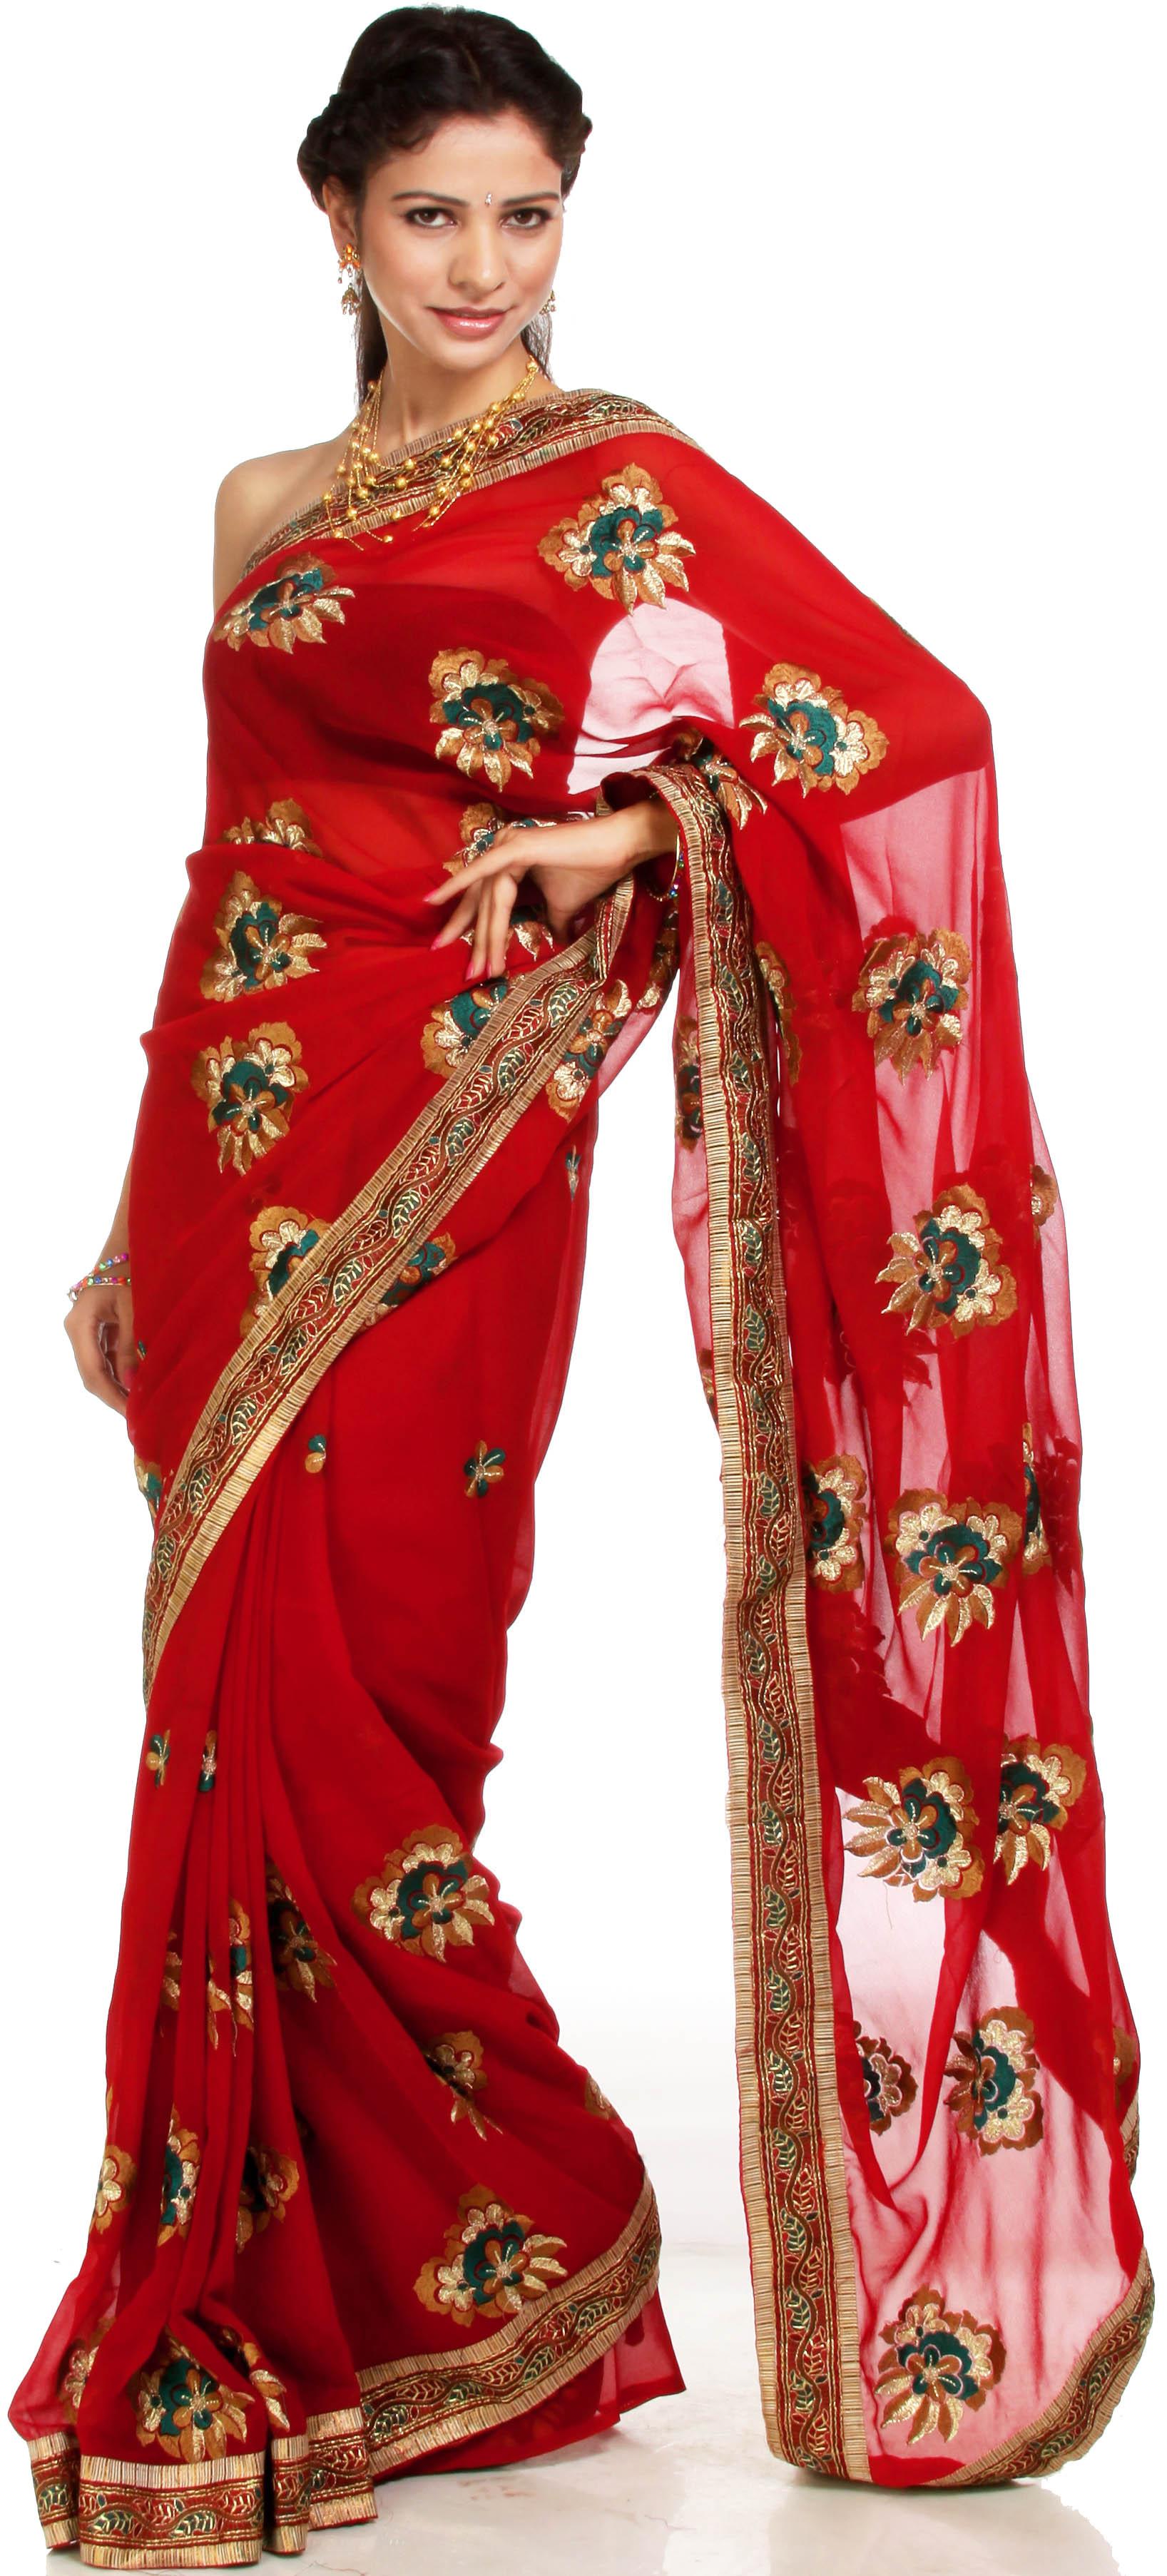 garnetred sari with large ari embroidered flowers sai75 - Traditional Wedding Skirts